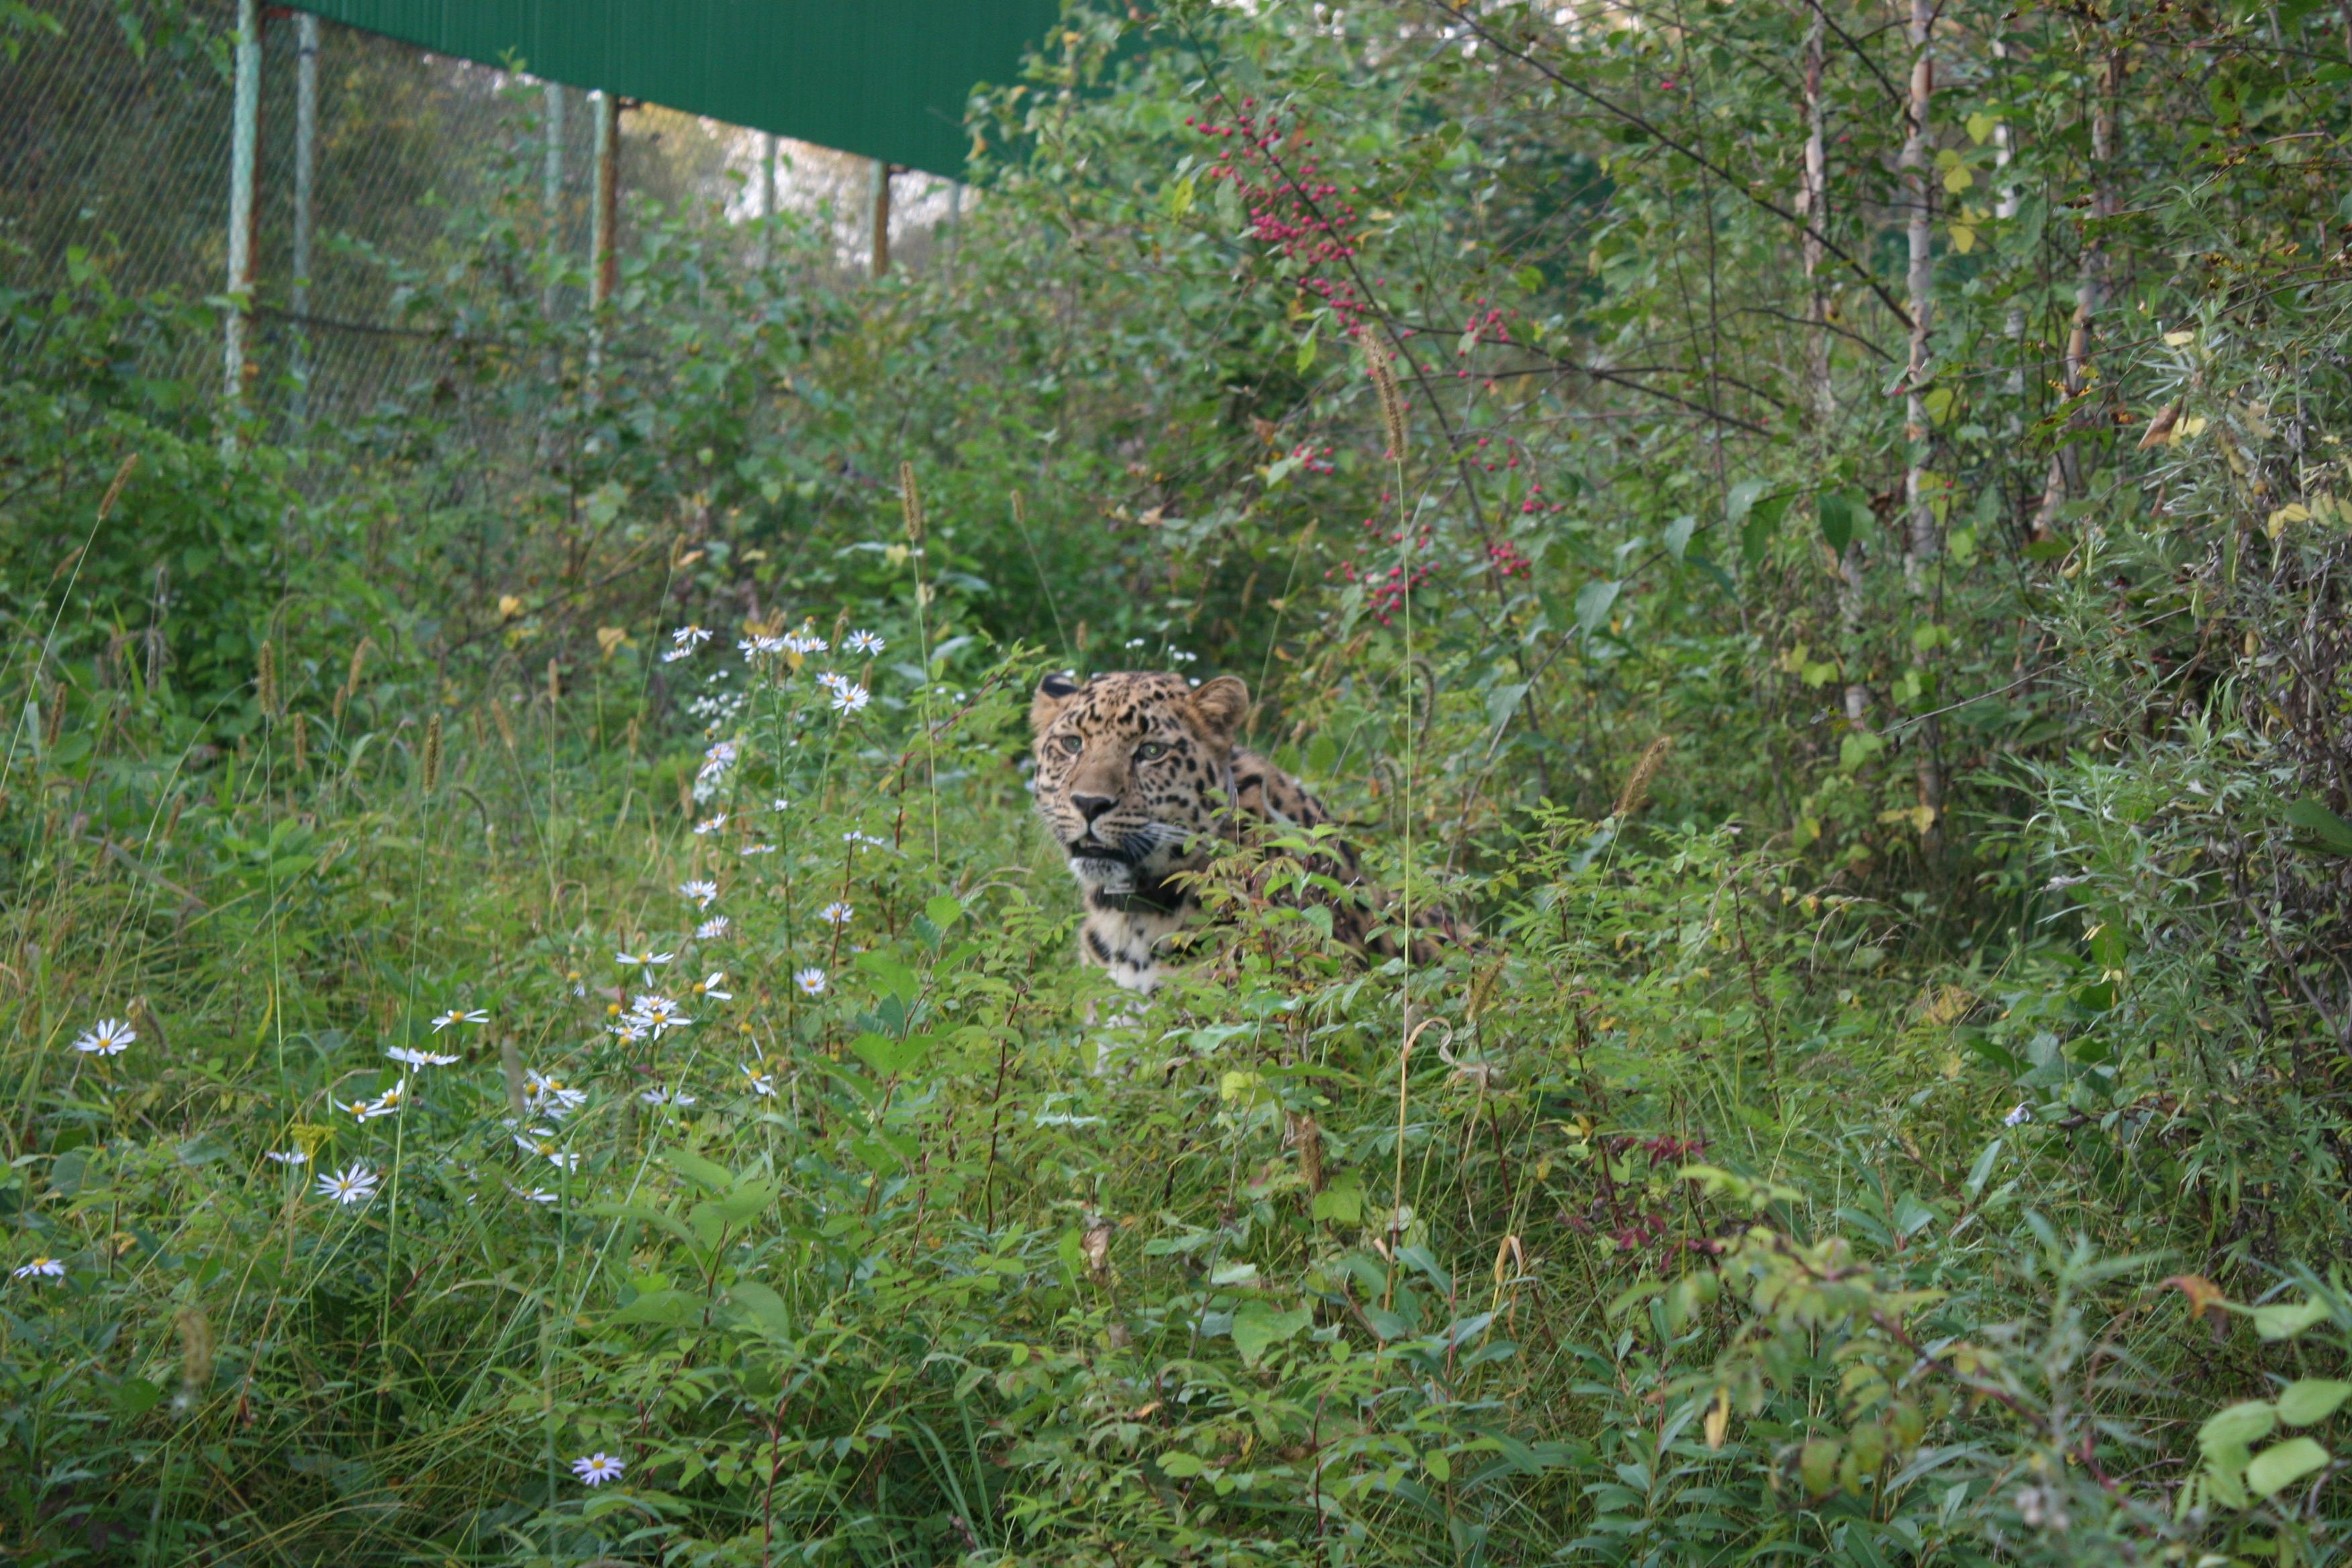 маскировка леопарда